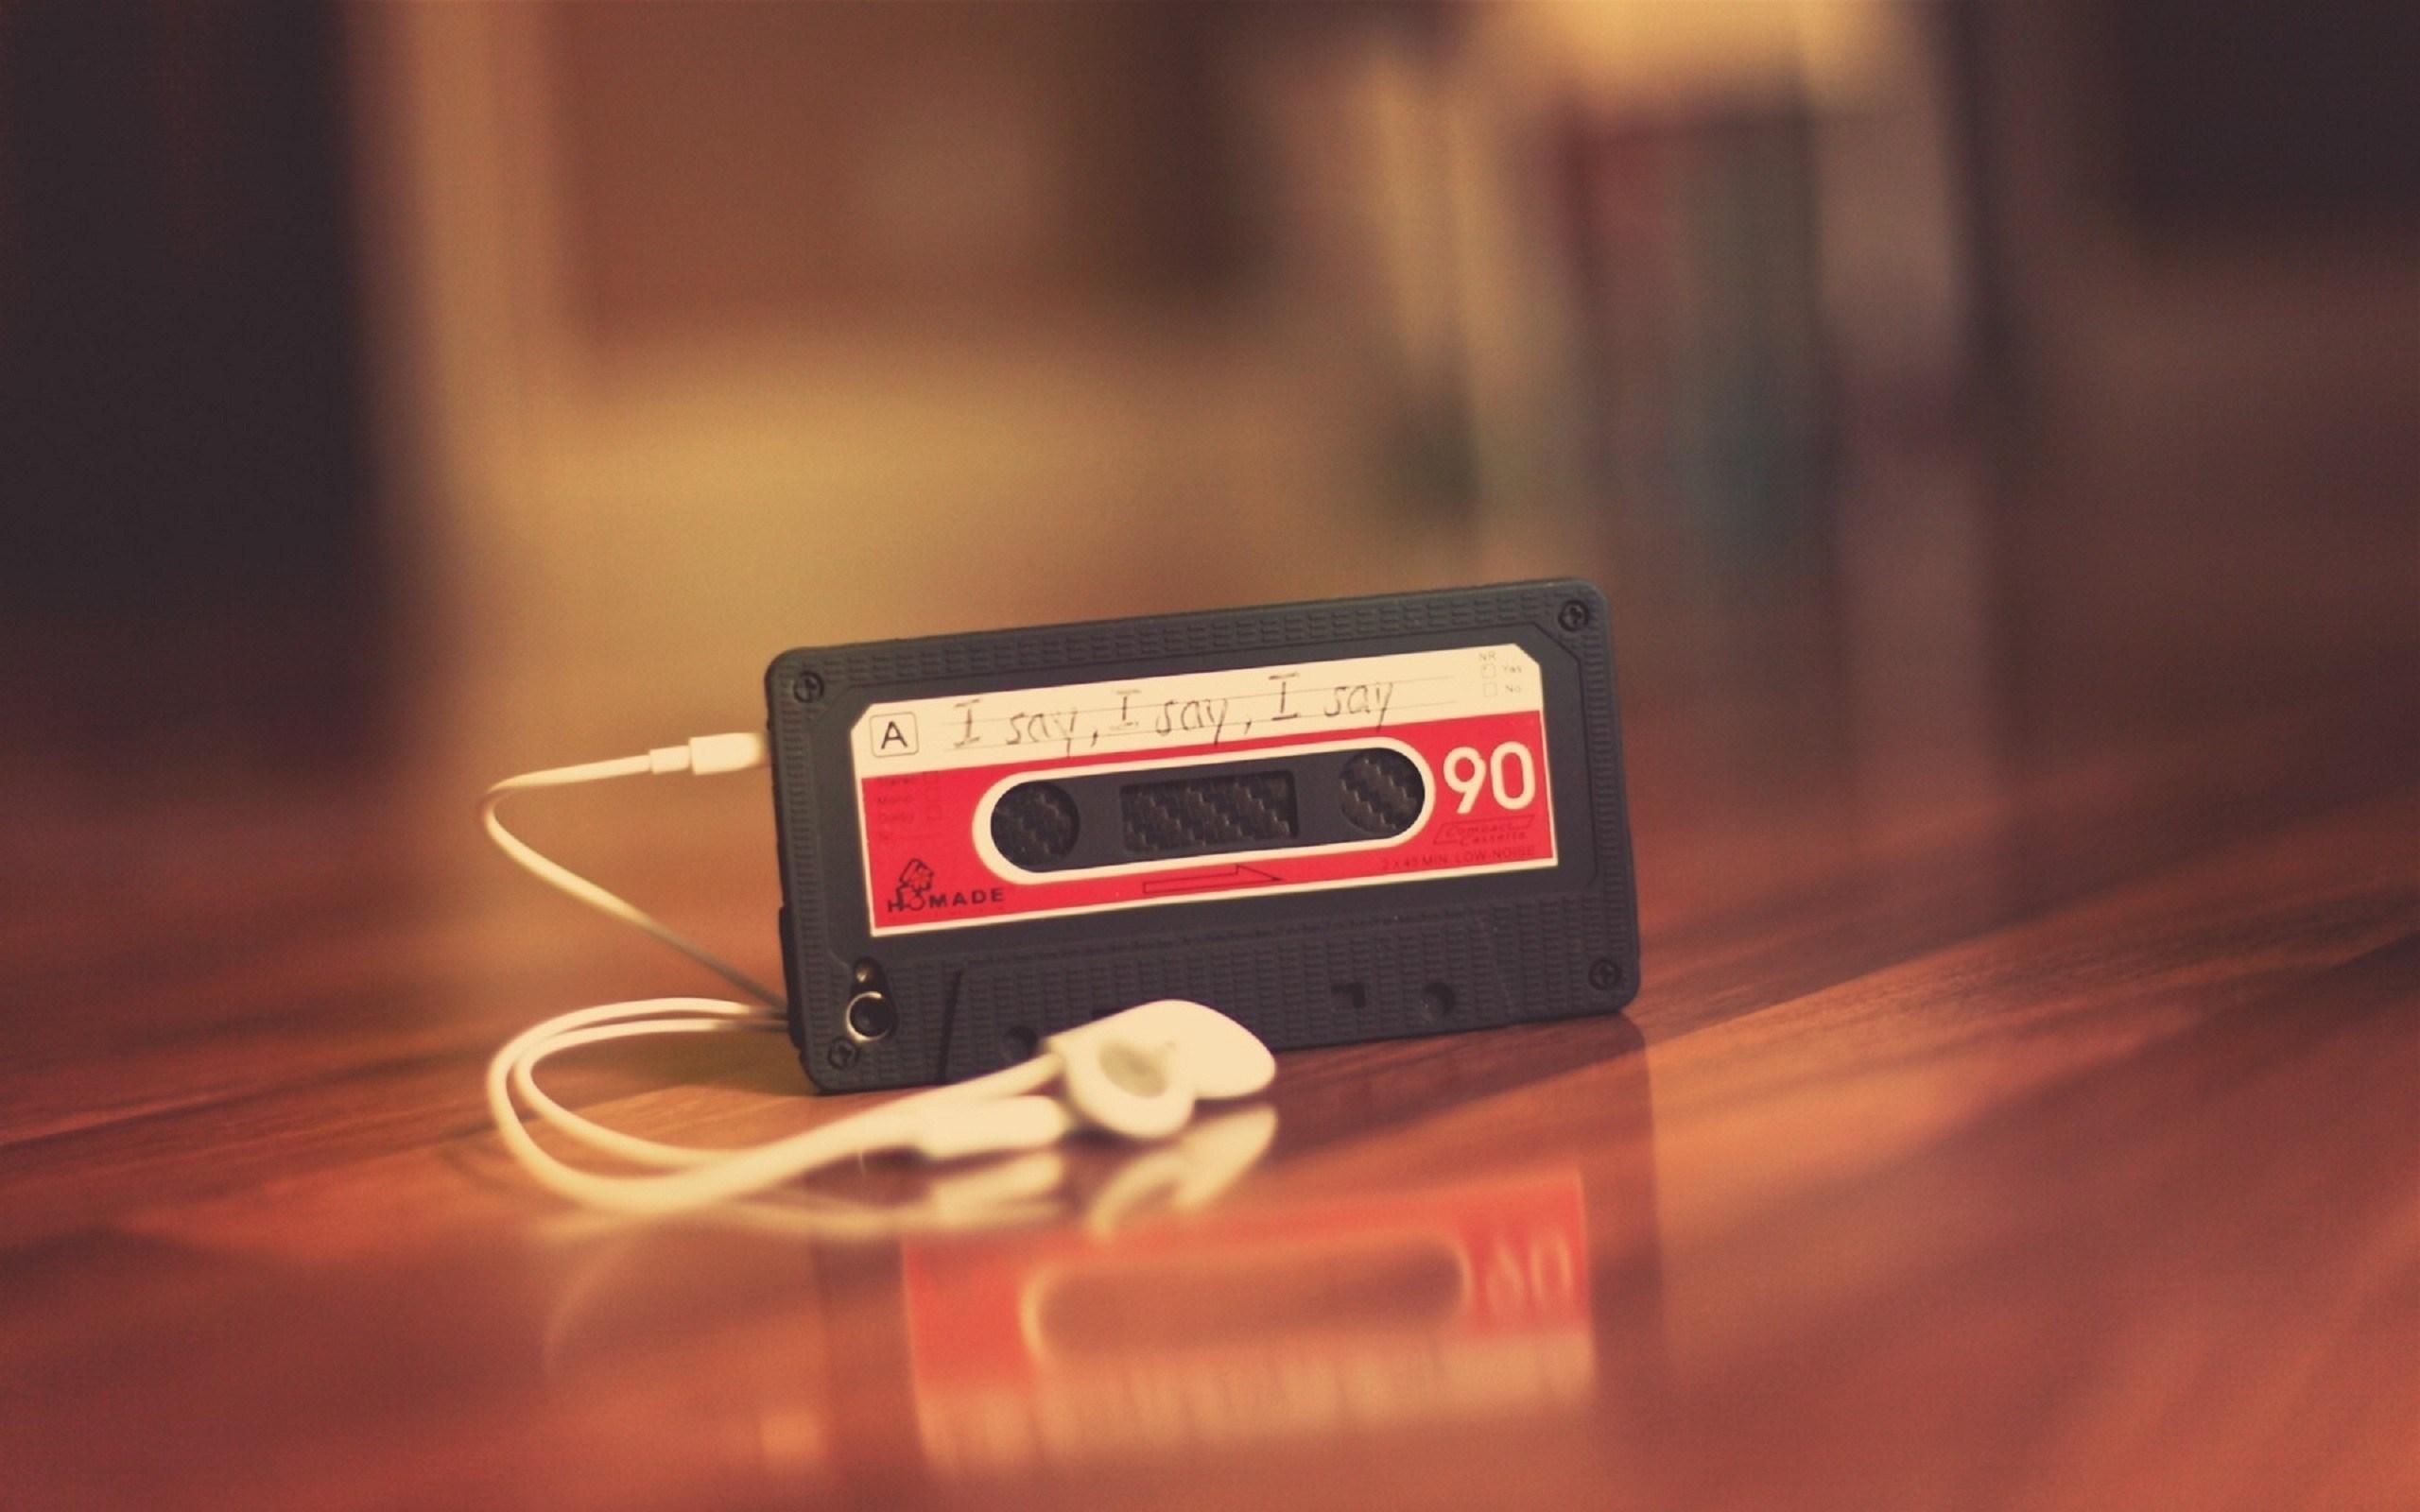 Cassette Player Headphones Music Mood Photo Wallpaper 2560x1600 28645